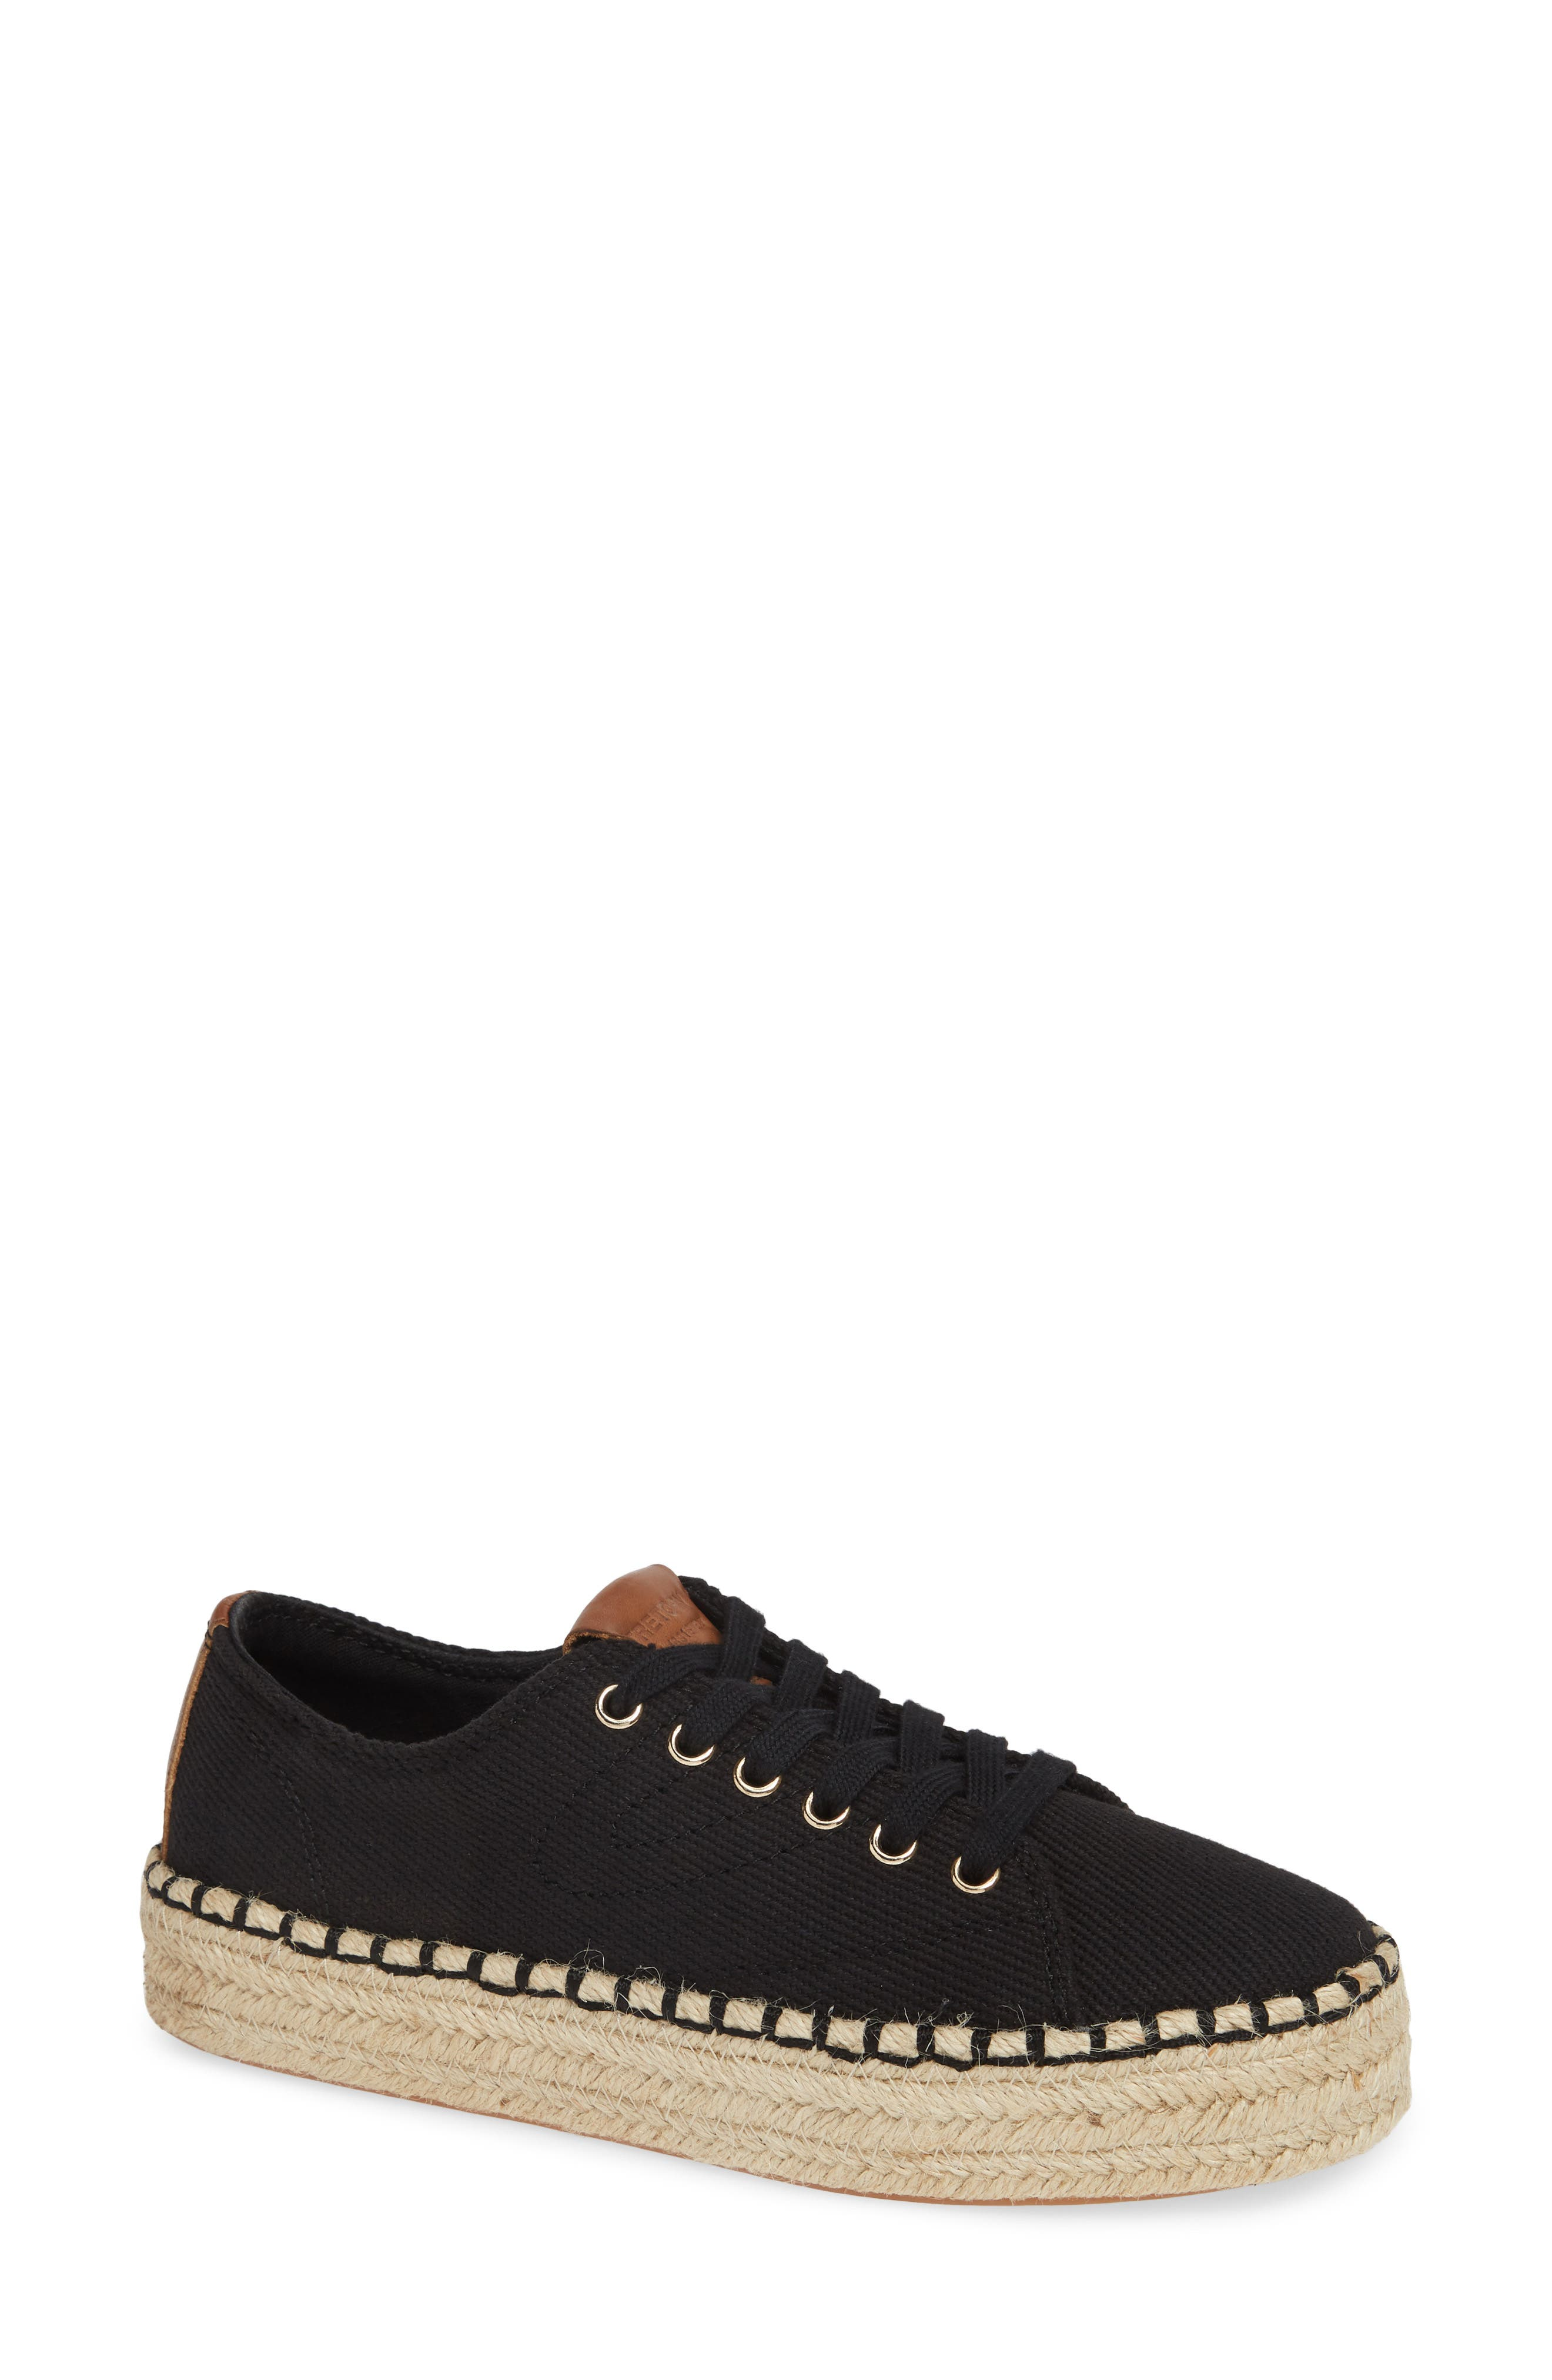 Platform Espadrille Sneaker, Main, color, BLACK/ KONA TAN FABRIC